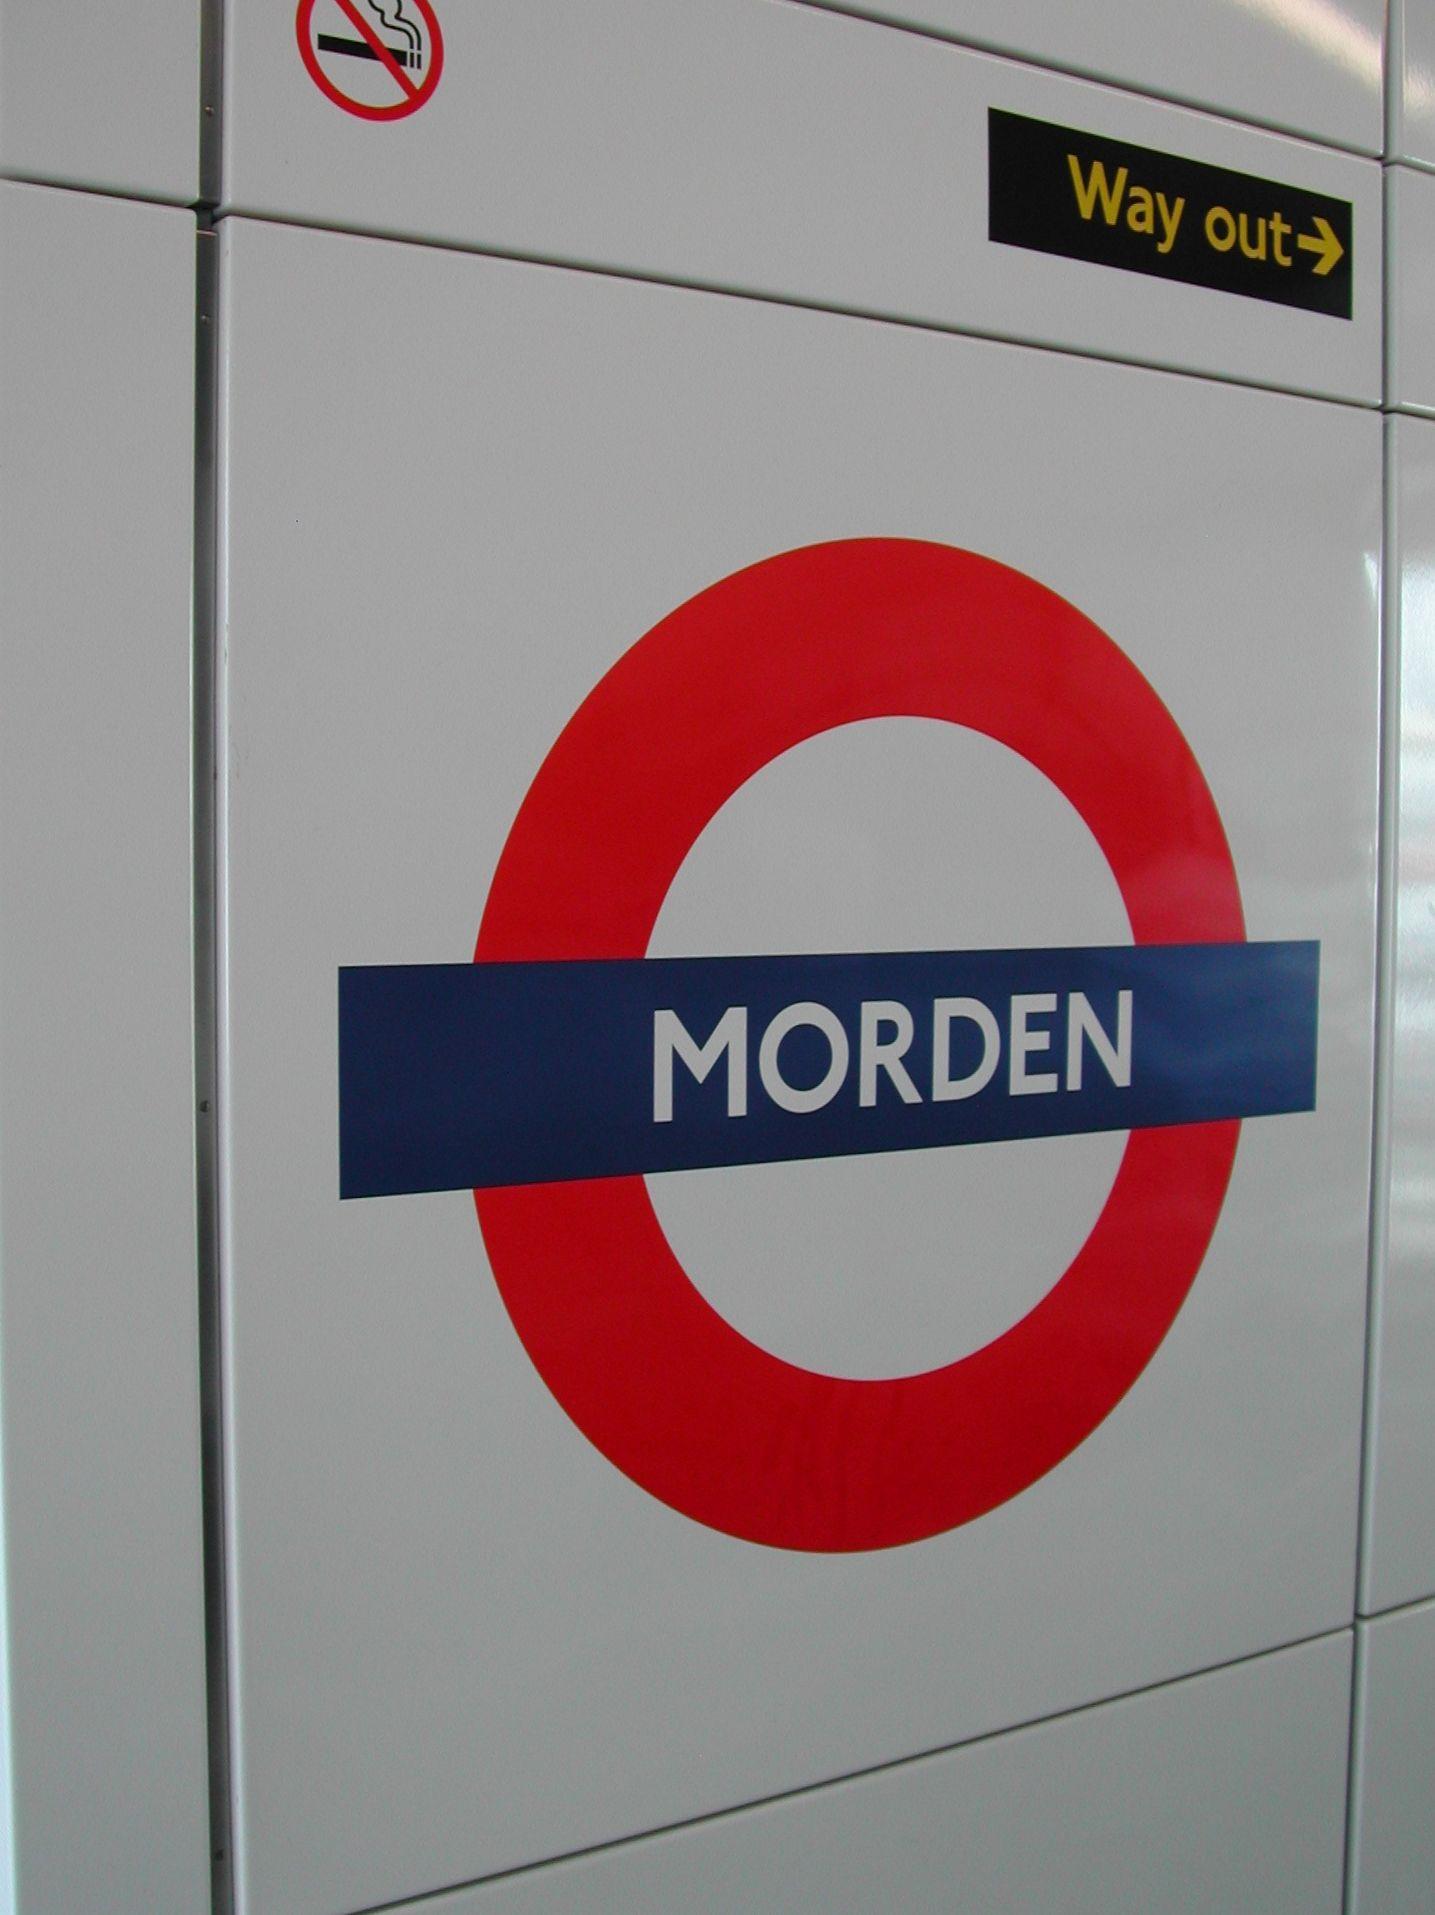 morden-station-vitreous-enamel-signage